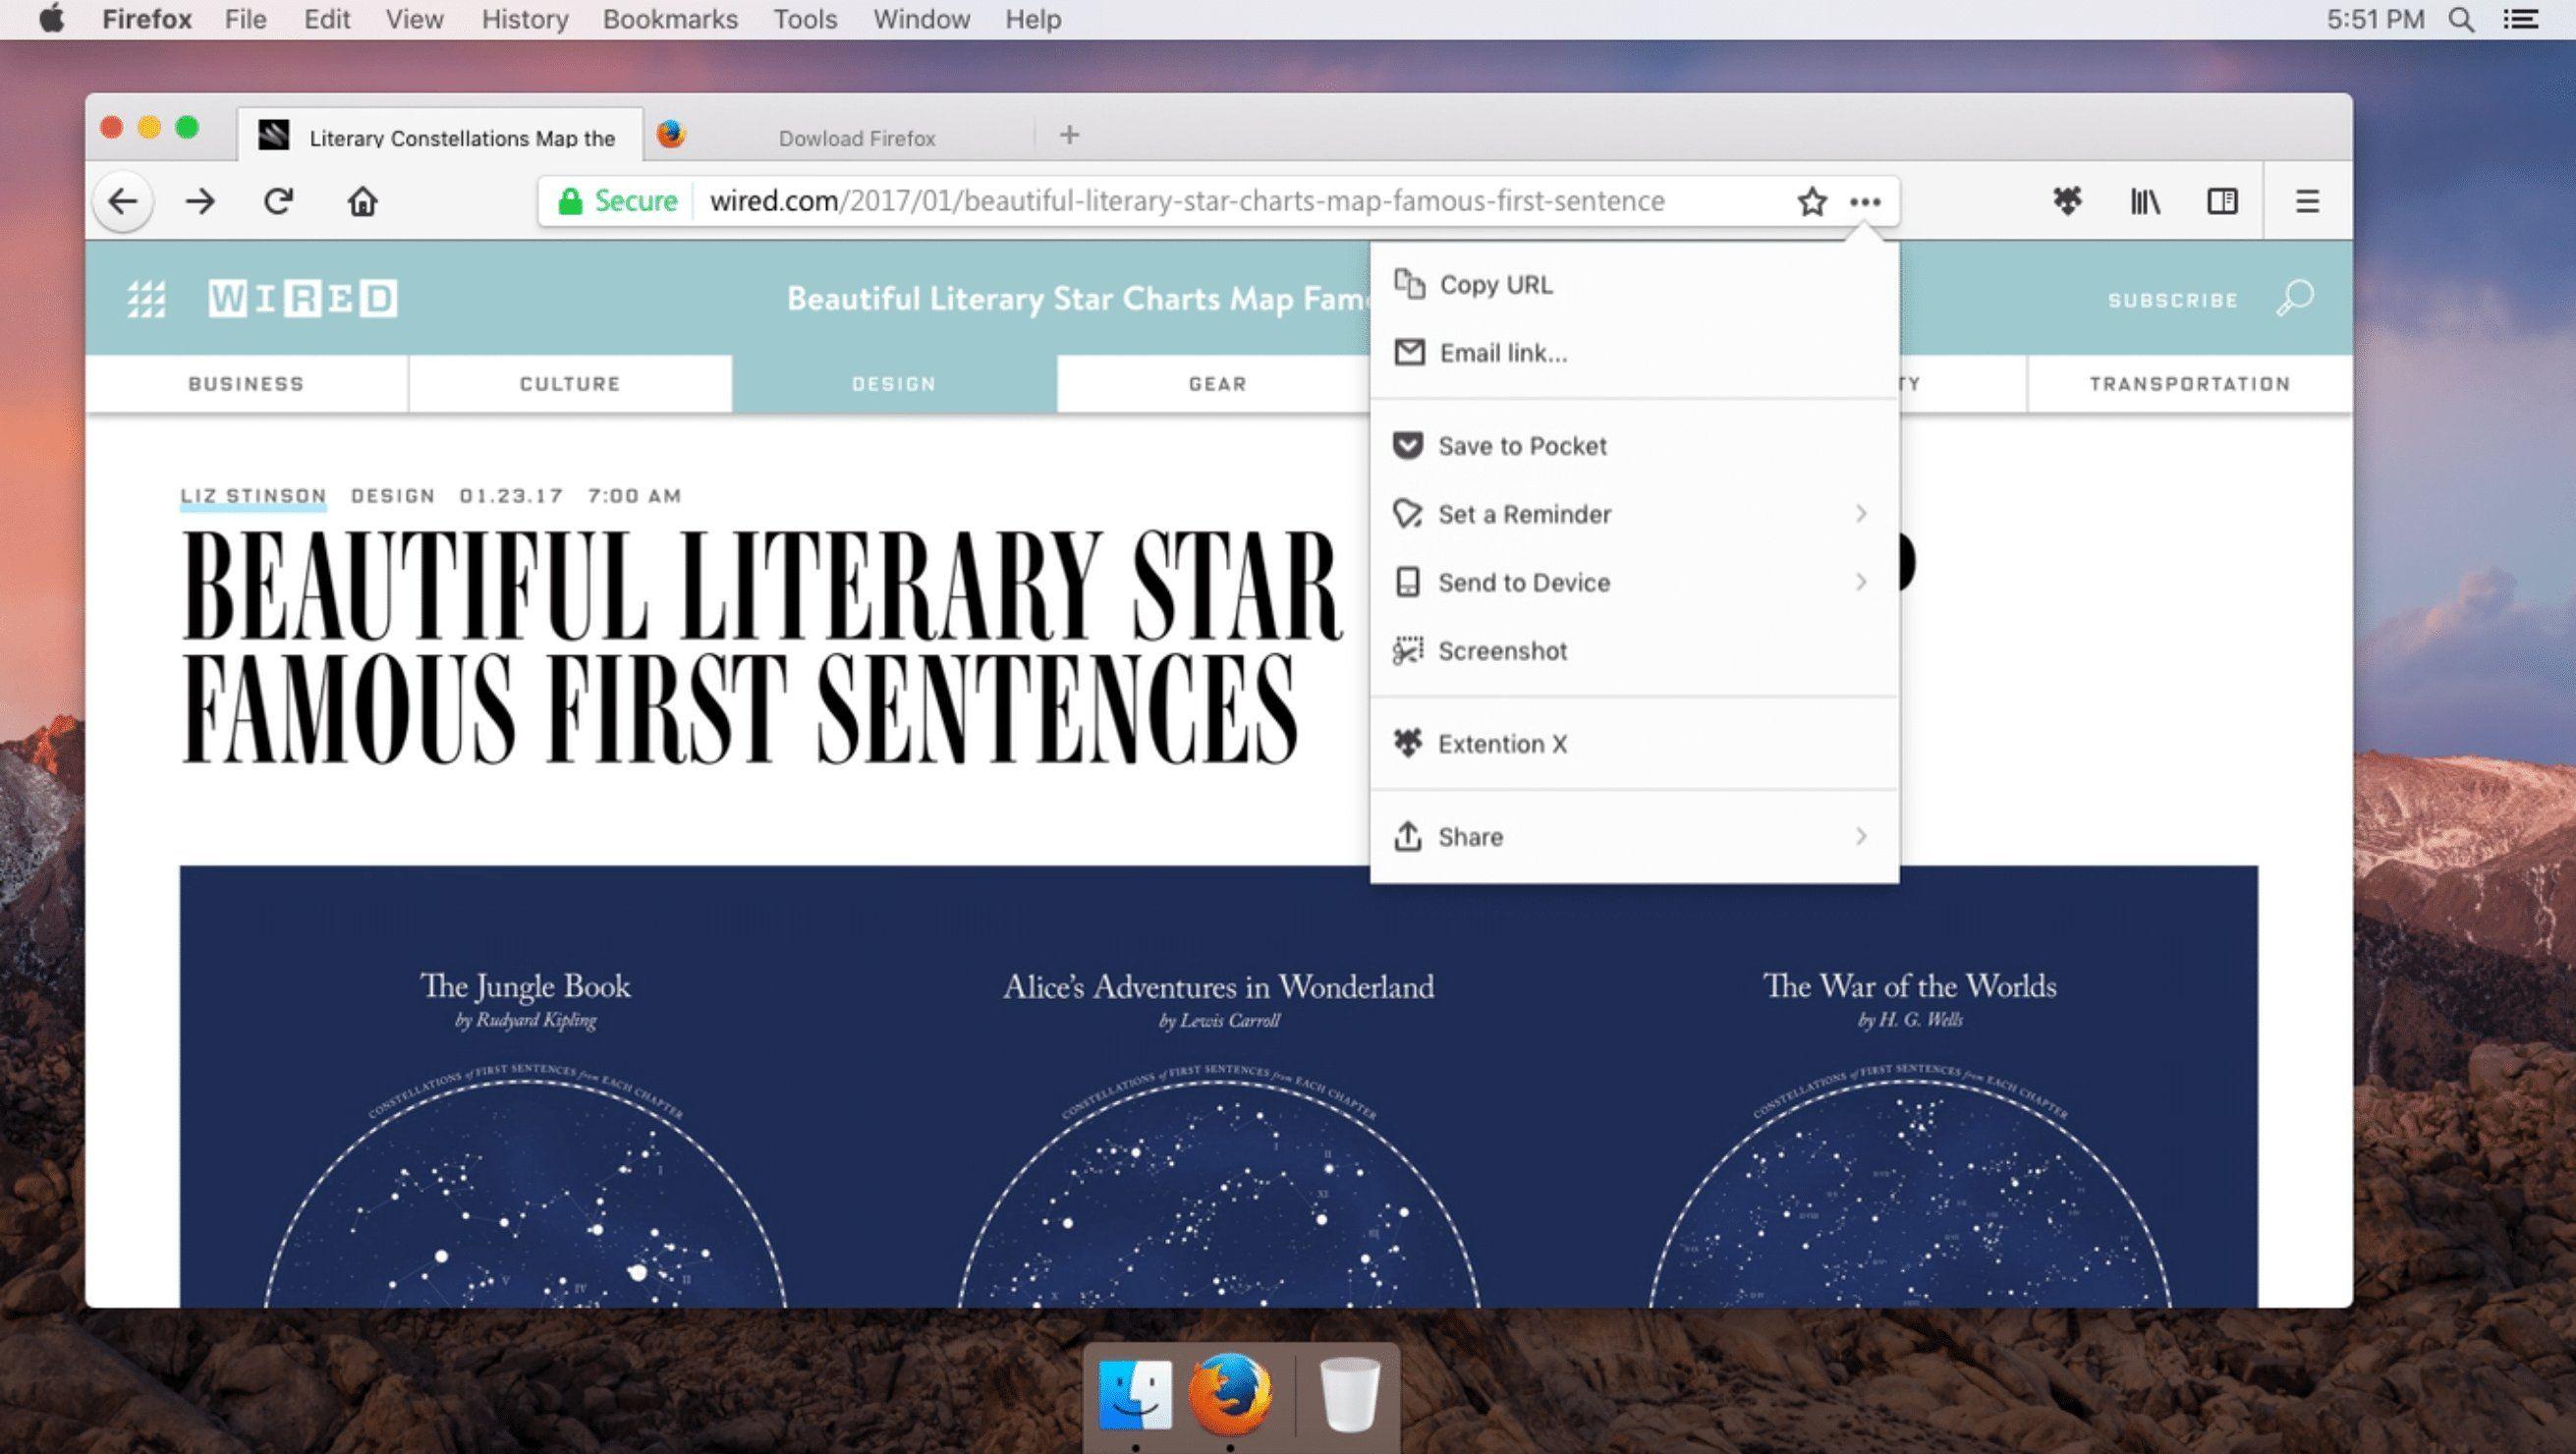 Mozilla Firefox Photon UI For Mac - Showing Arrow Panel